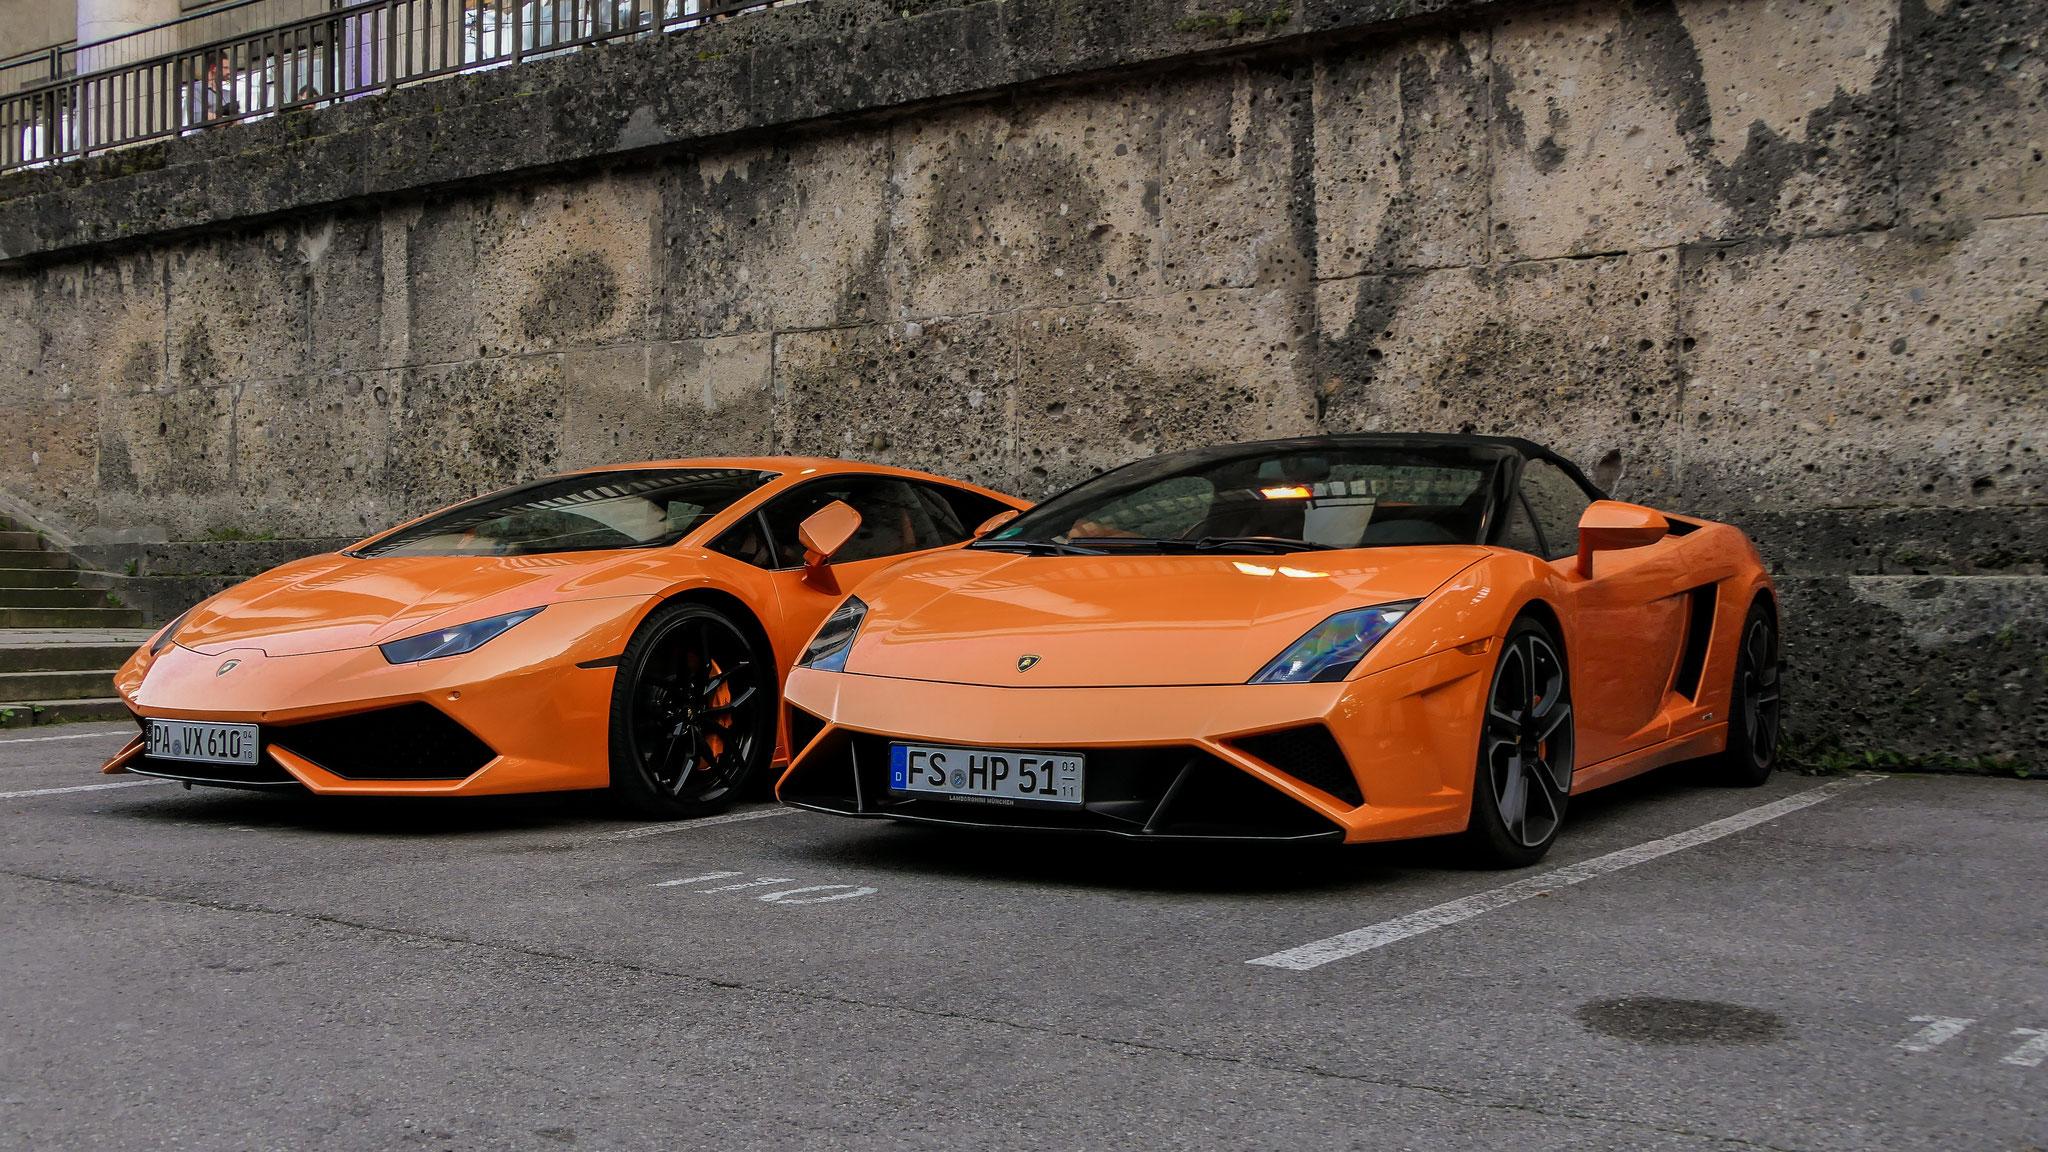 Lamborghini Gallardo LP 560 Spyder - FS-HP-51